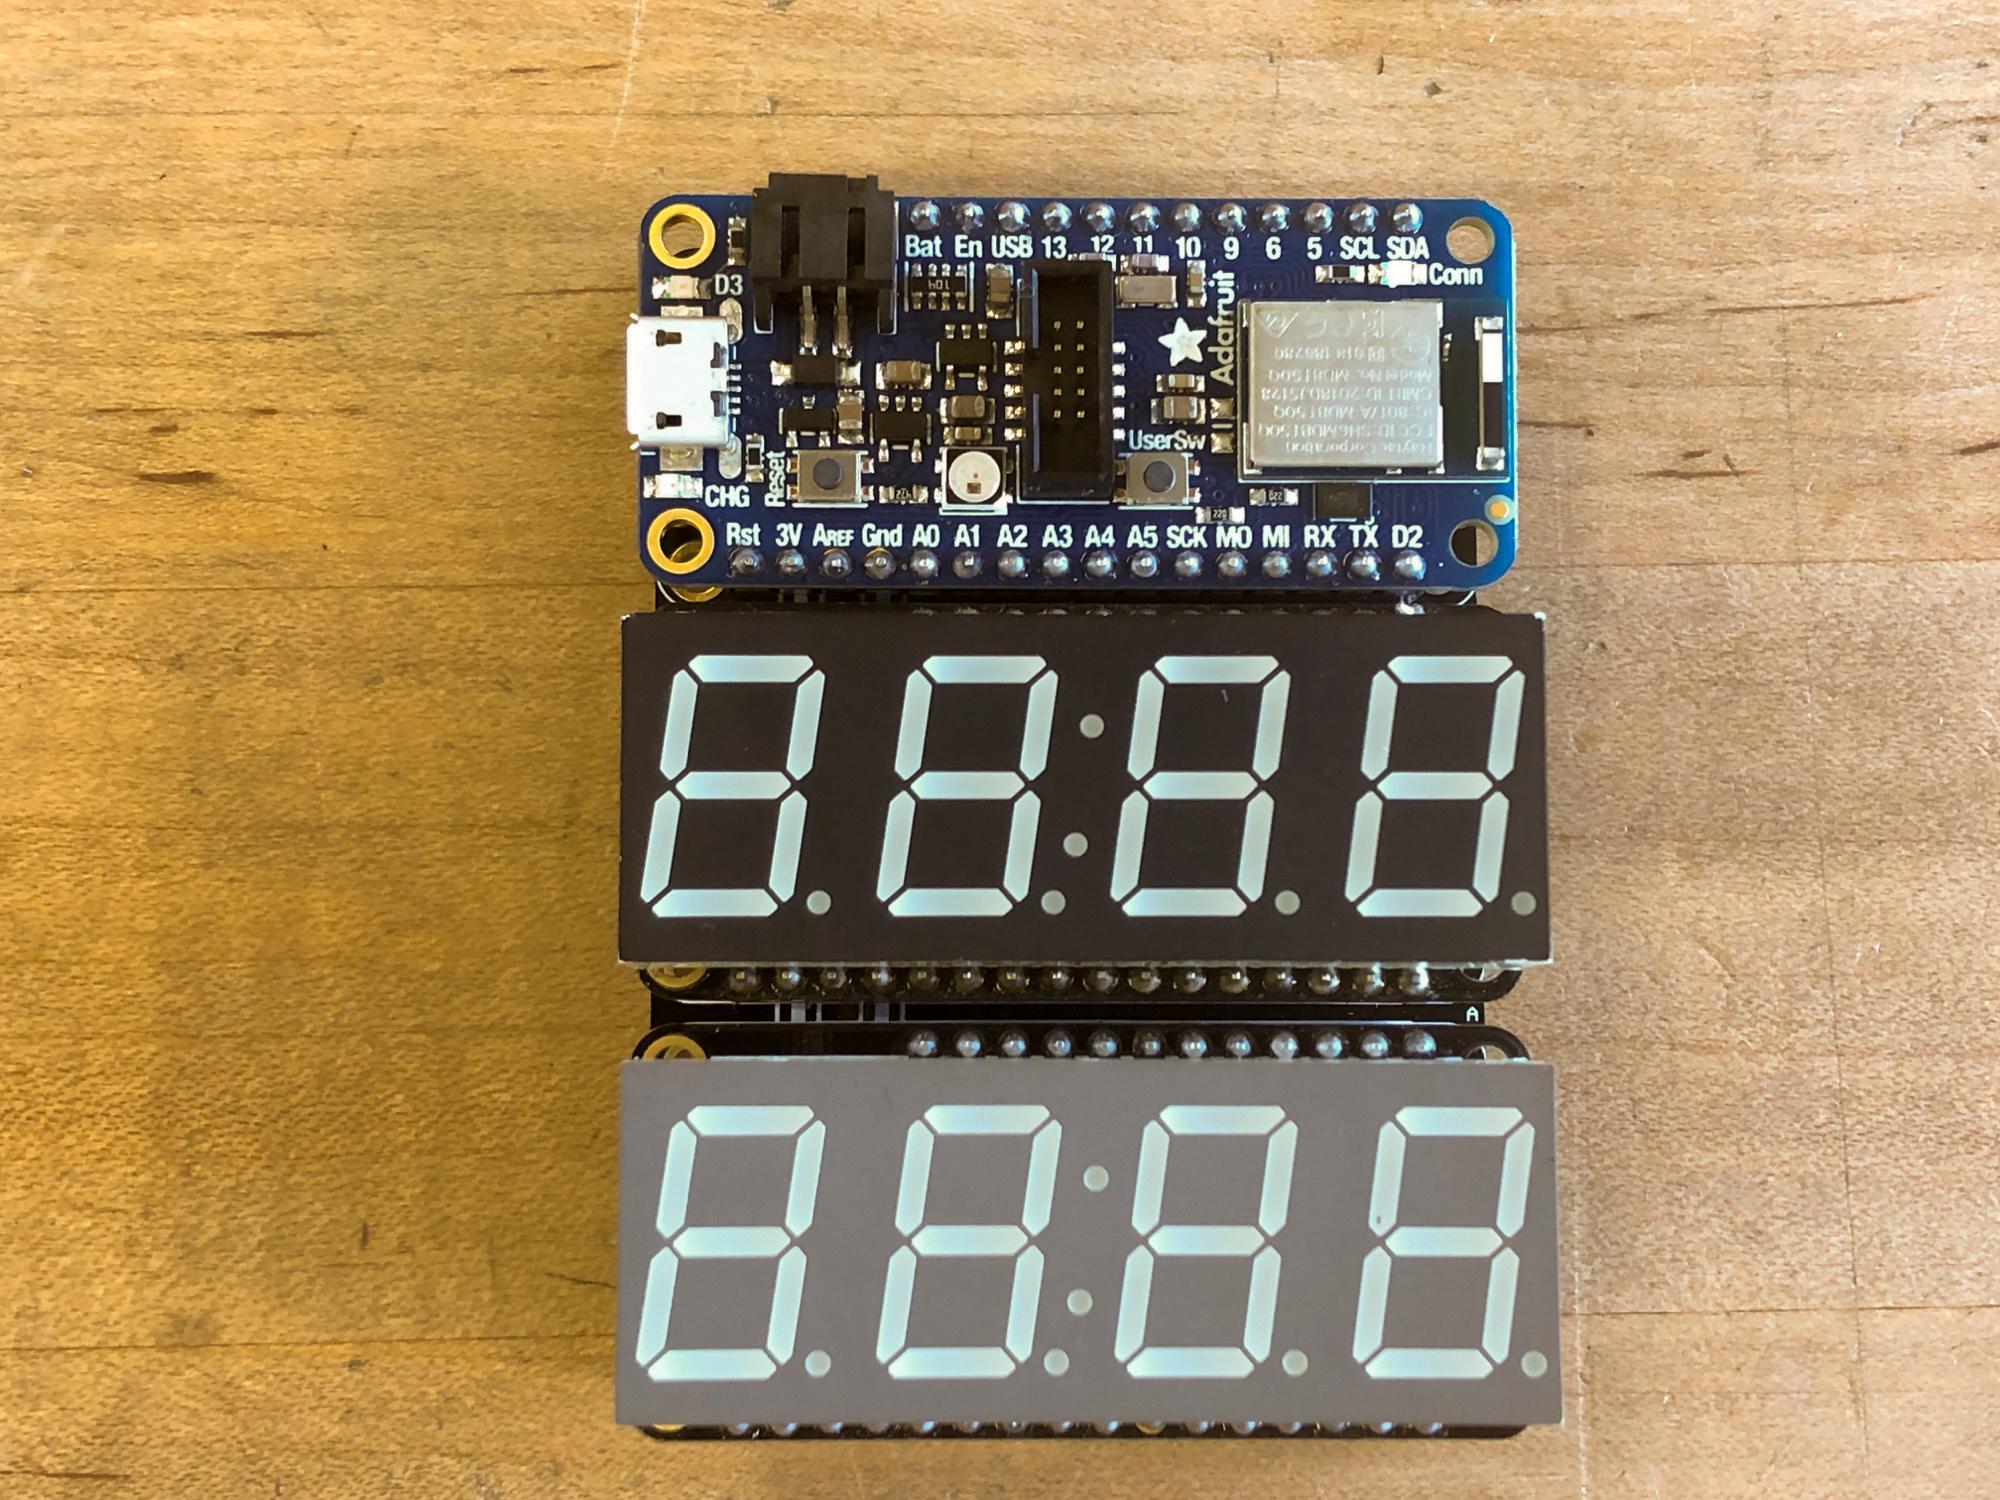 circuitpython_hrt_build_0571_new2k.jpg